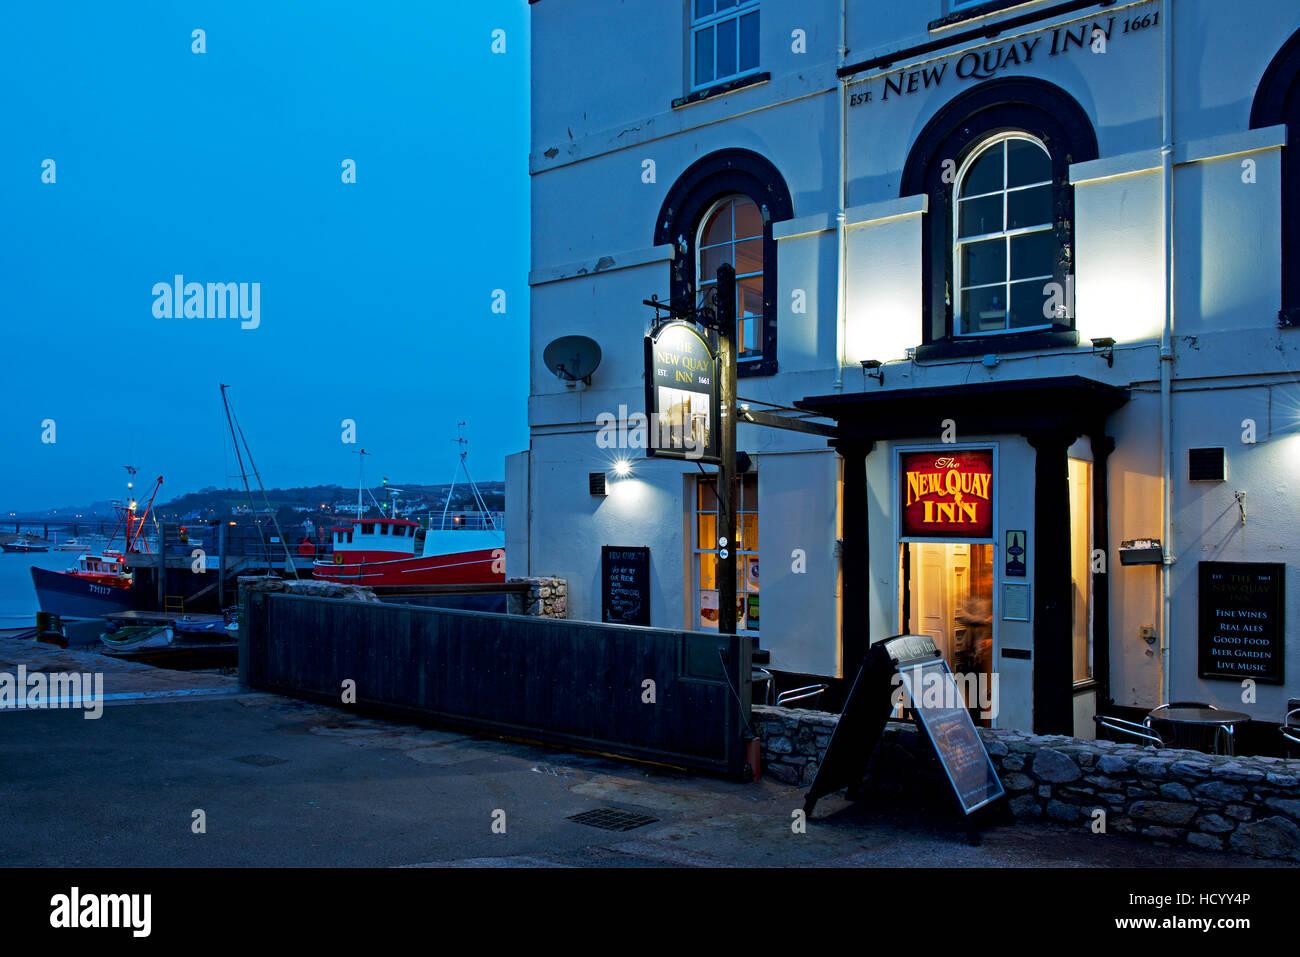 The New Quay Inn at night, Teignmouth, Devon, England UK - Stock Image